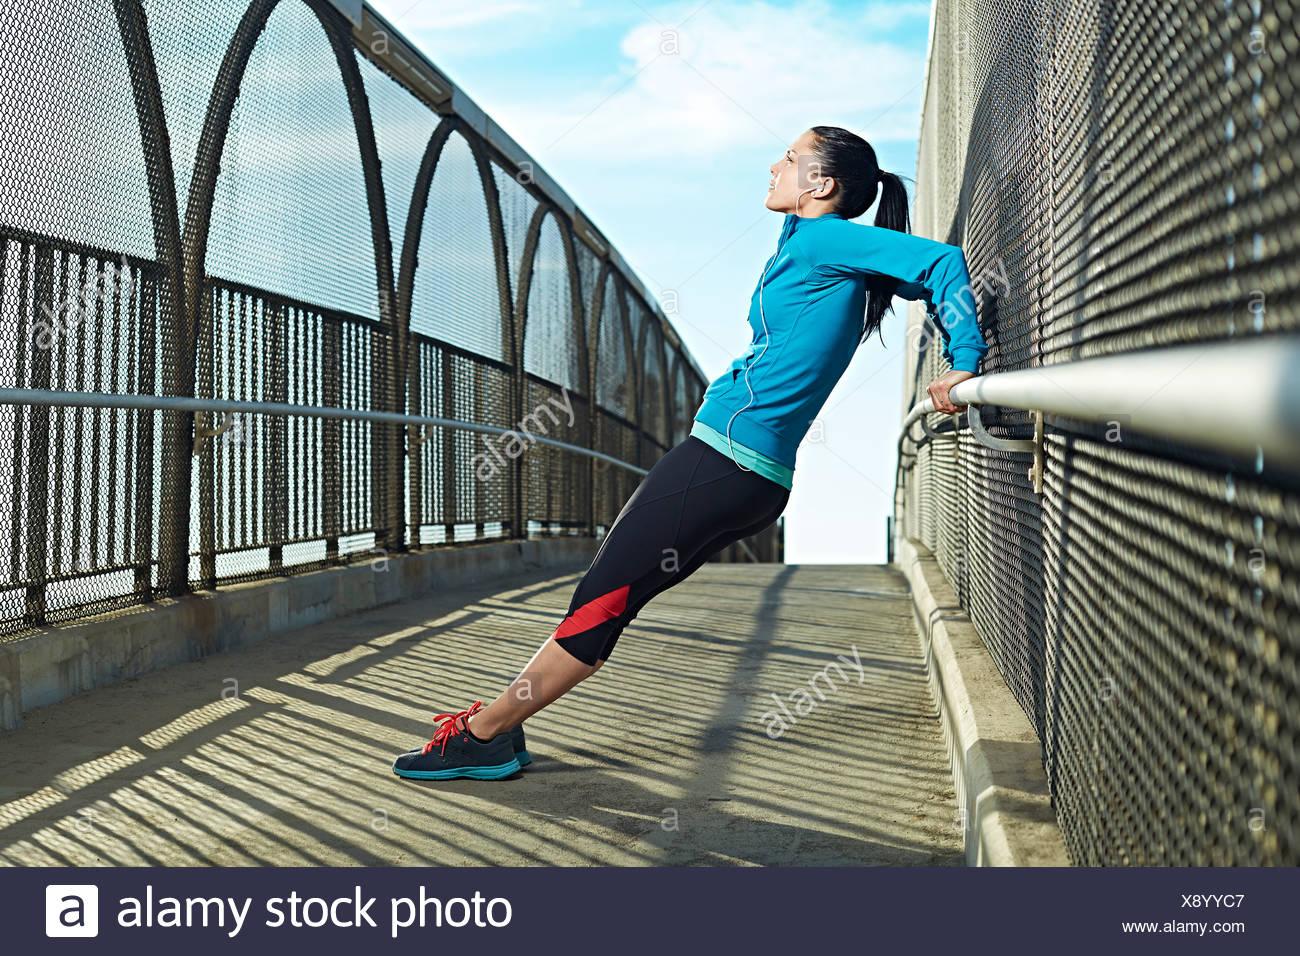 Mid adult woman stretching on bridge Photo Stock